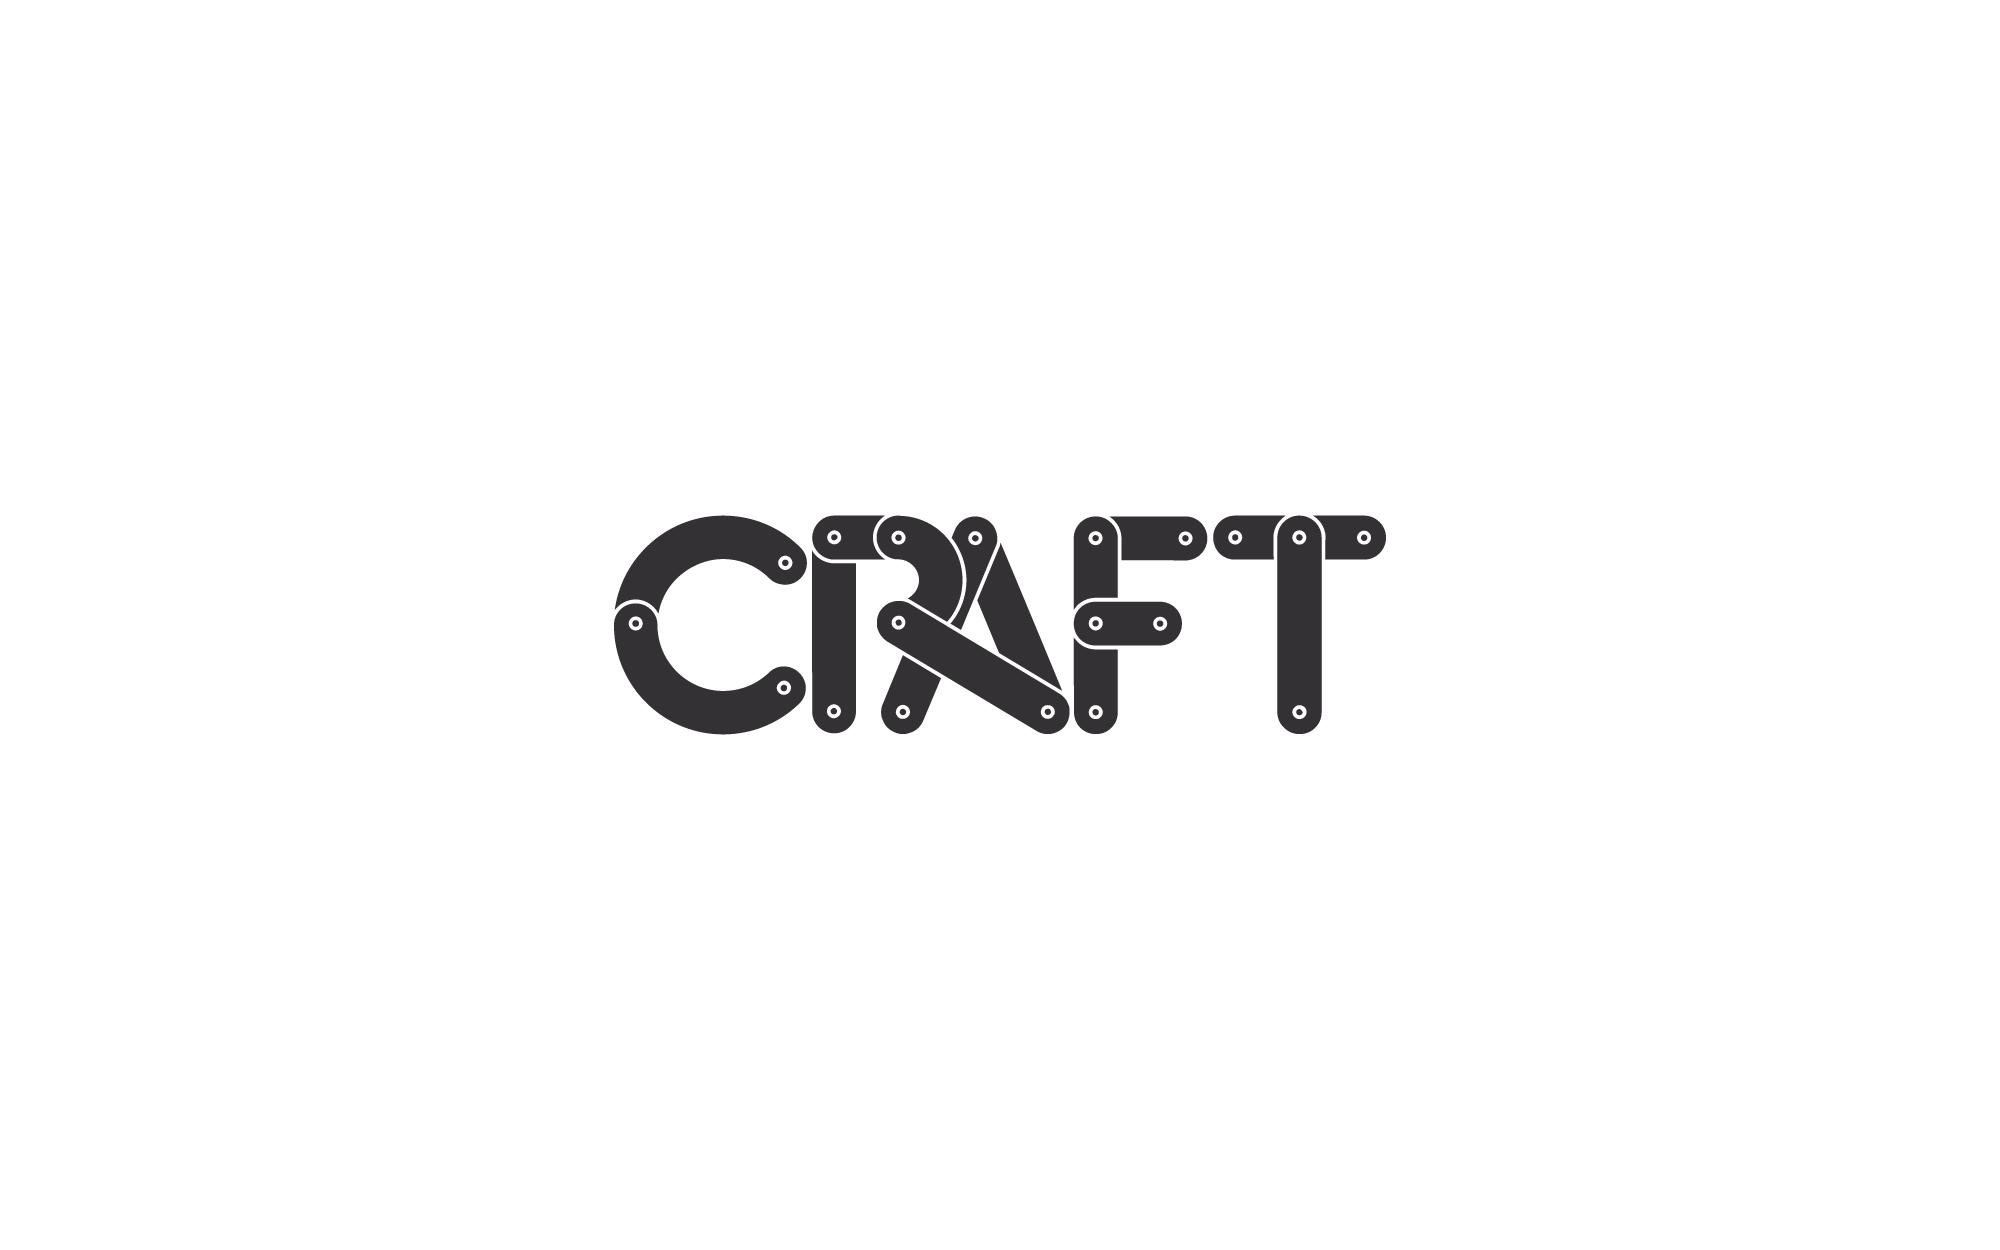 craft_logo_branding_design_matthew_pomorski_graphic_designer_kent